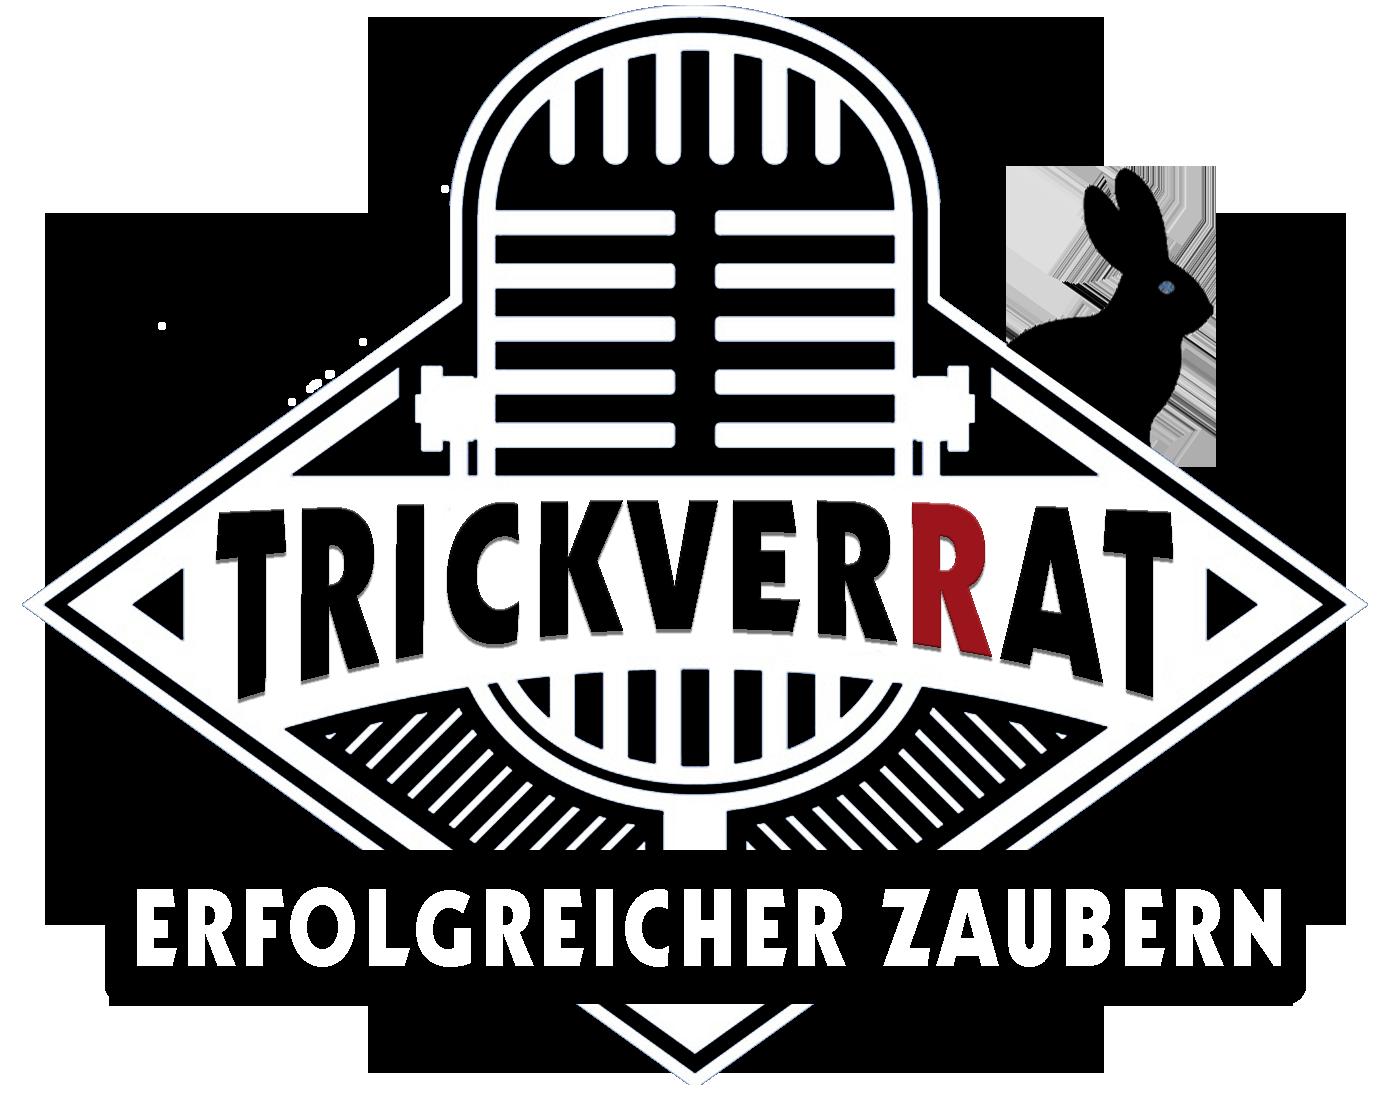 trickverrat.de